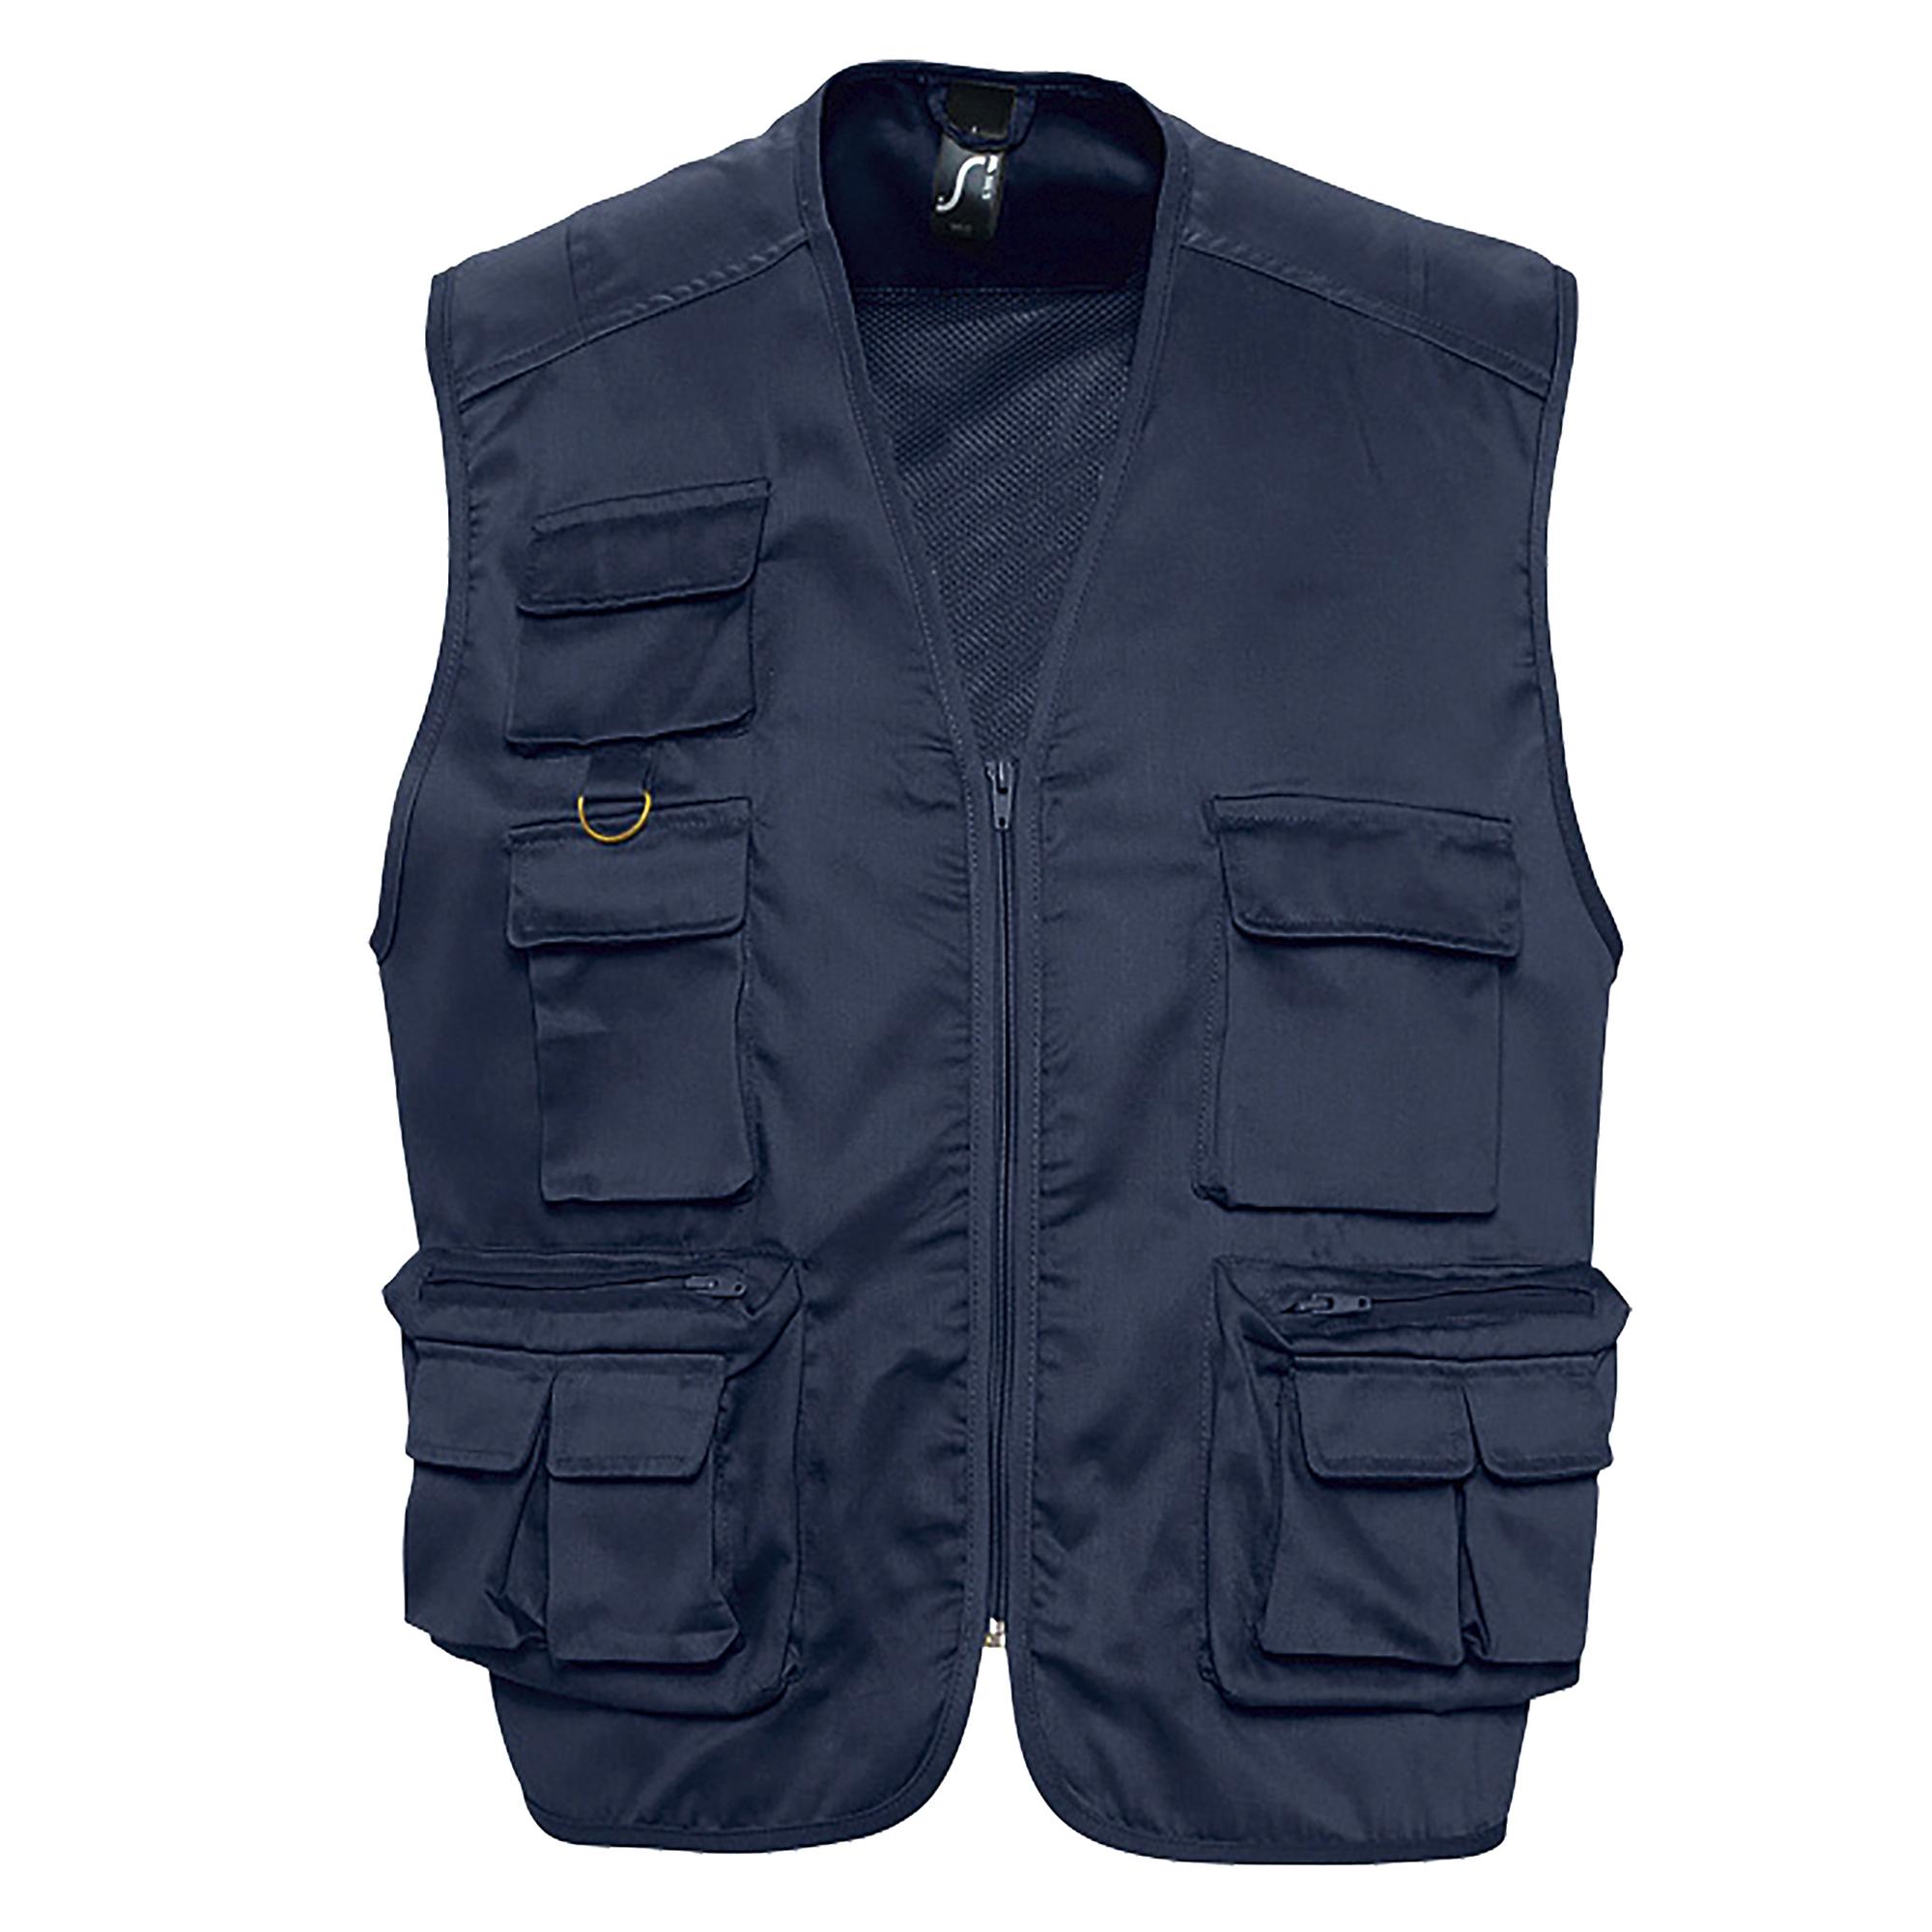 SOLS Wild Unisex Full Zip Waistcoat Bodywarmer Jacket (3XL) (Black)